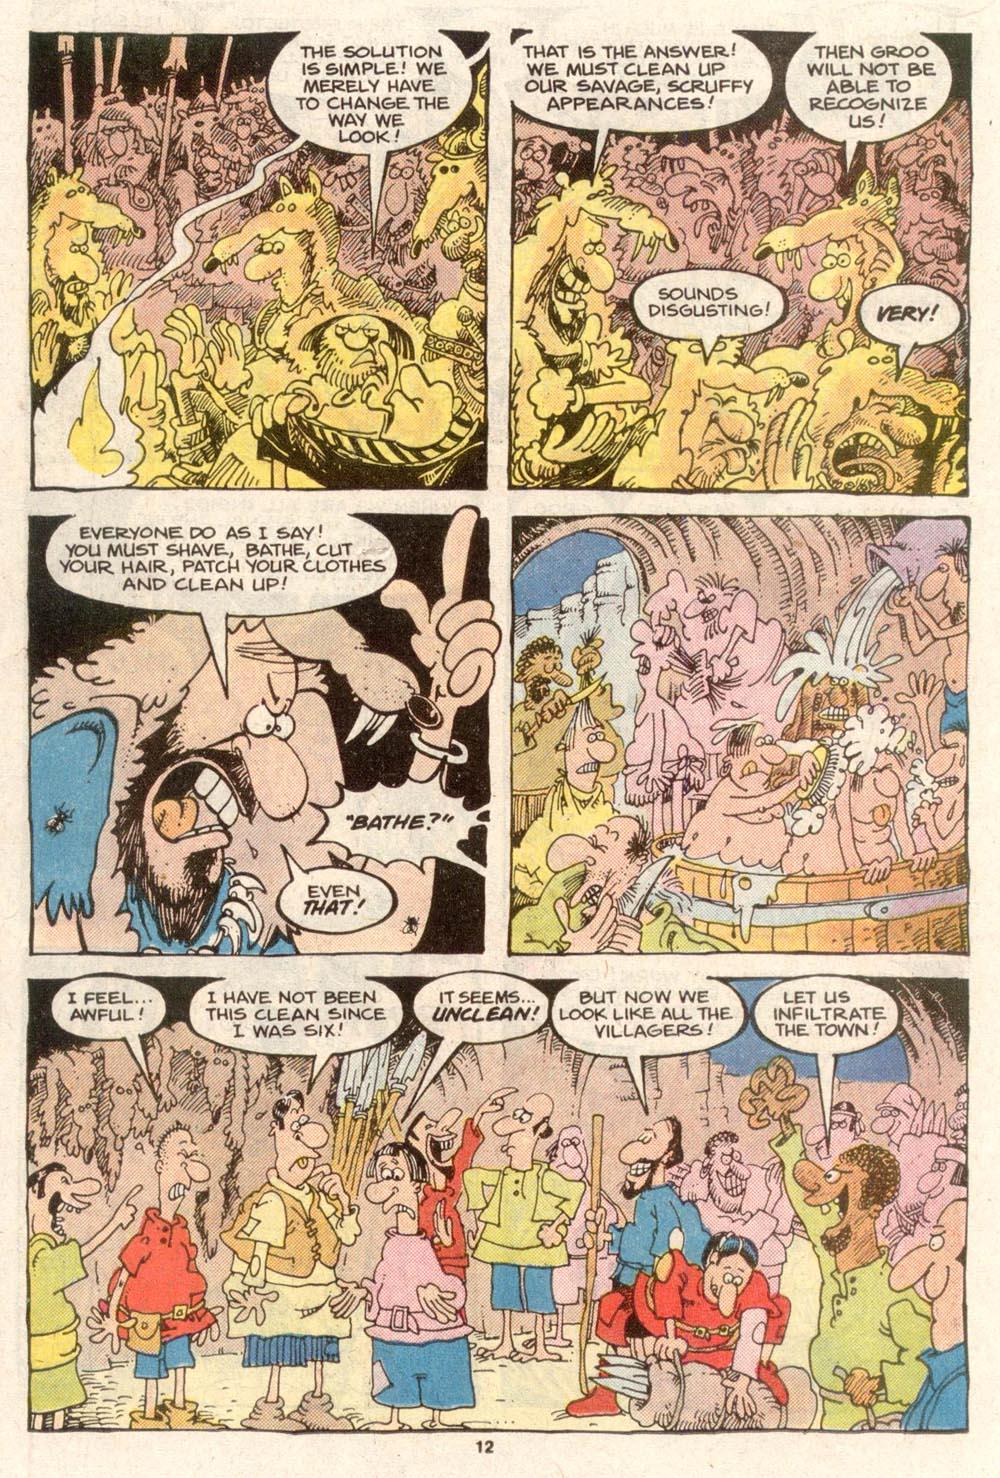 Read online Sergio Aragonés Groo the Wanderer comic -  Issue #49 - 12